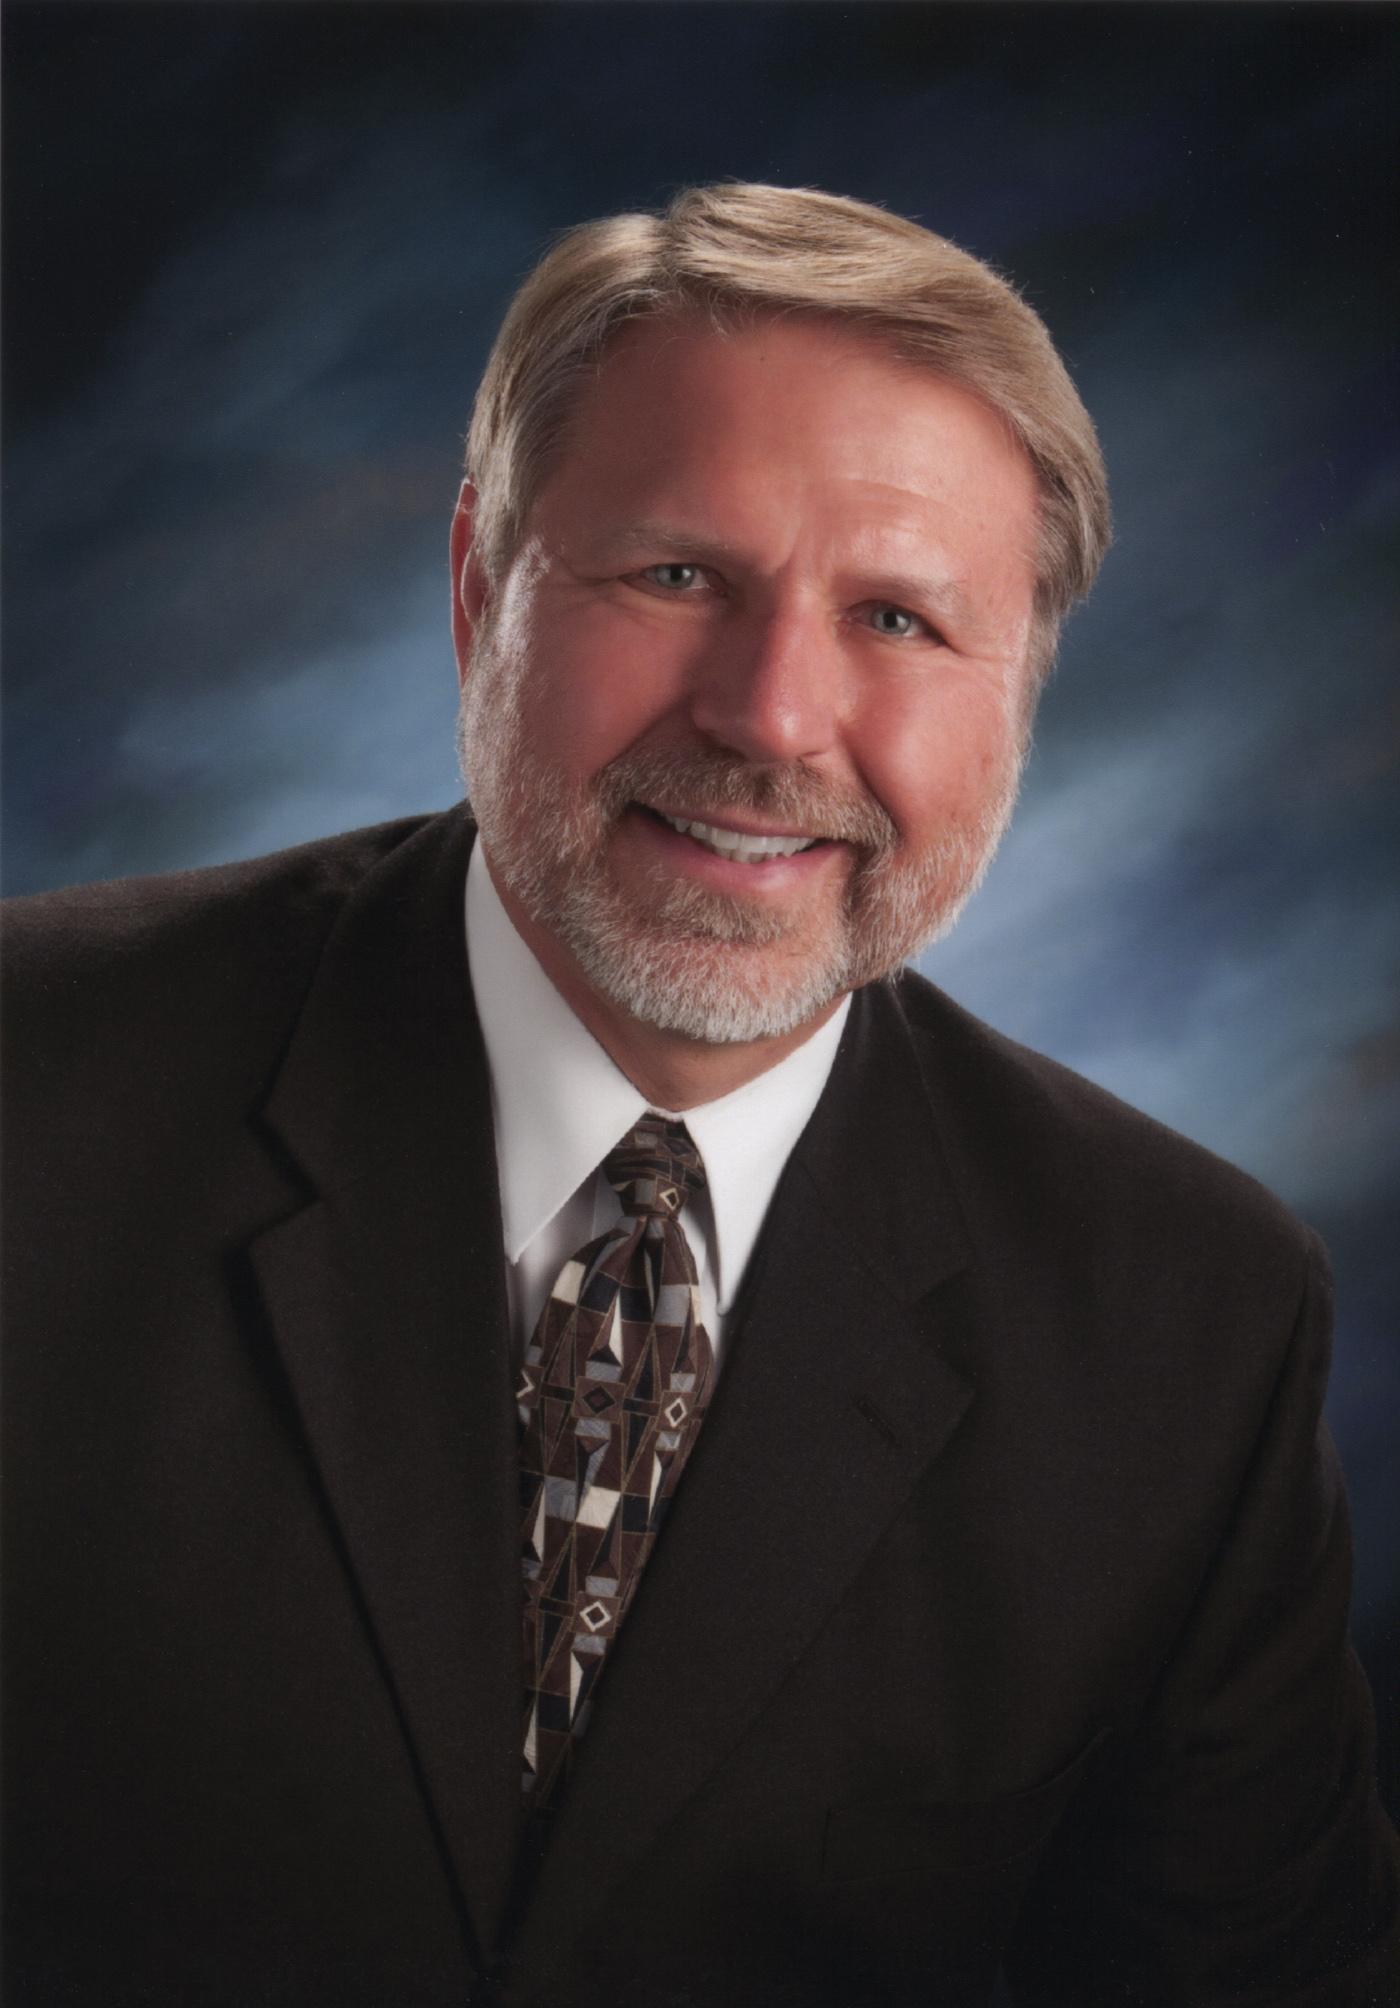 Dr. Rick Kolenda